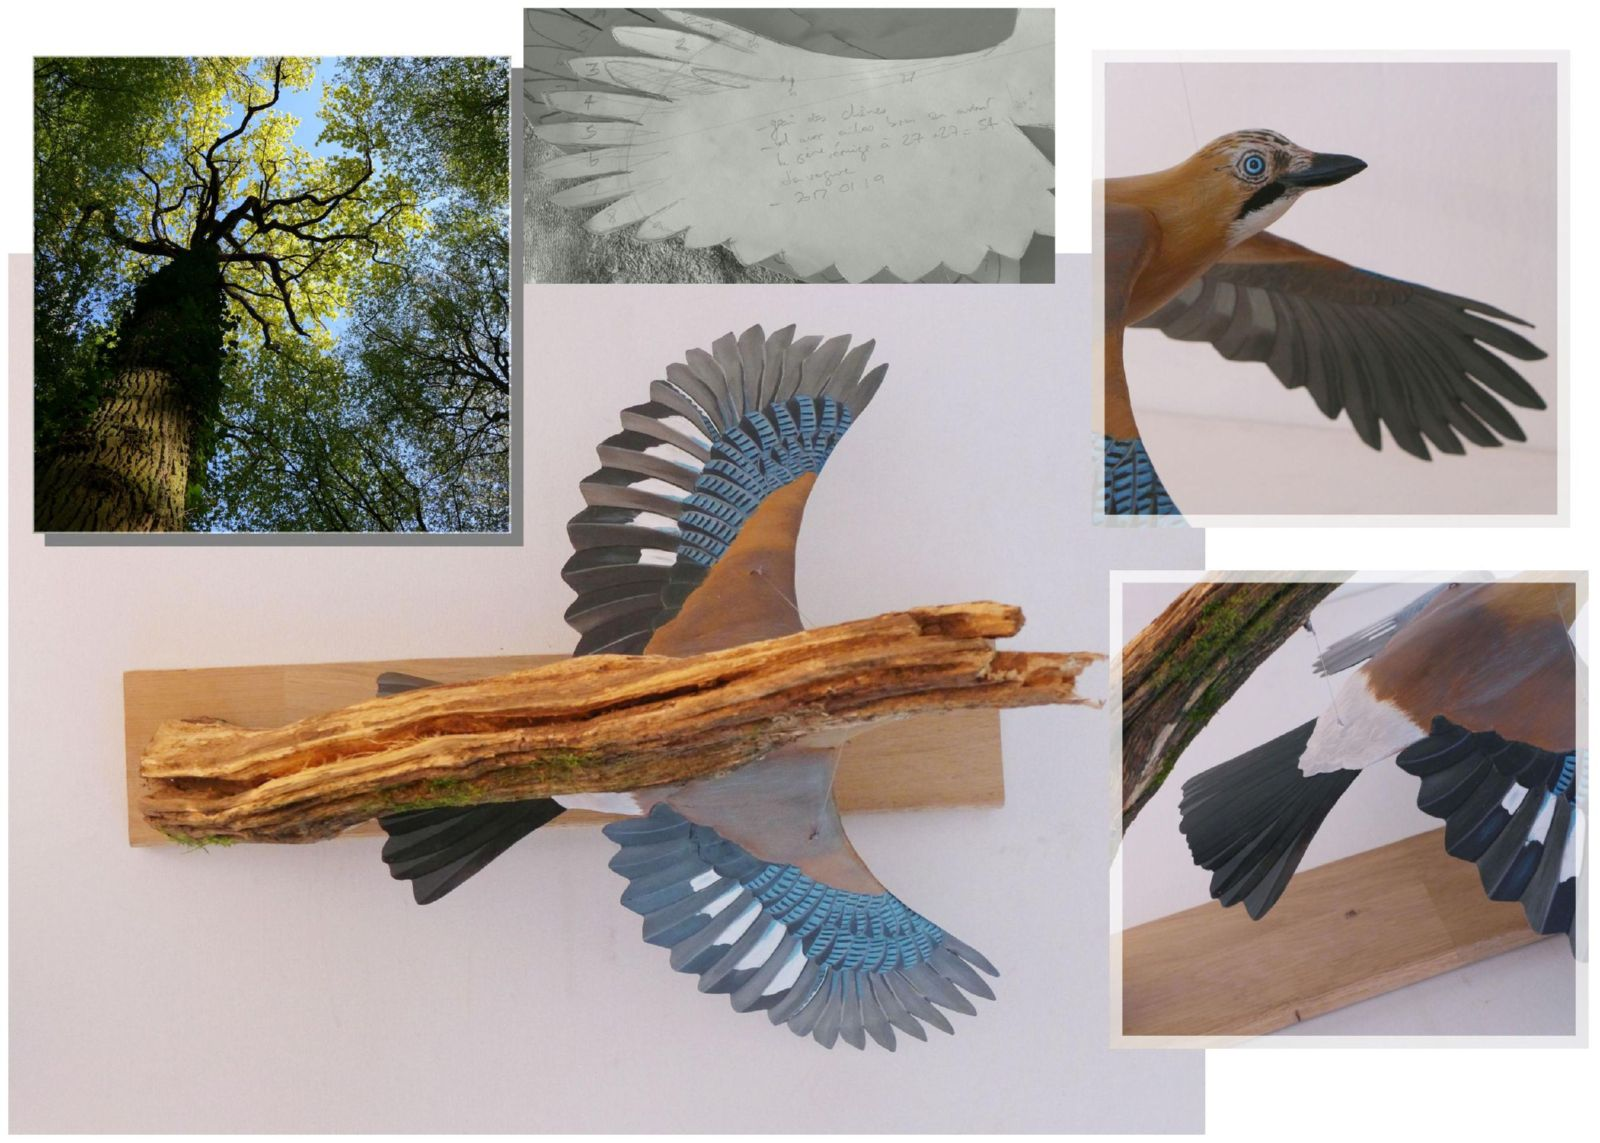 sculpture geai des chênes eurasian jay